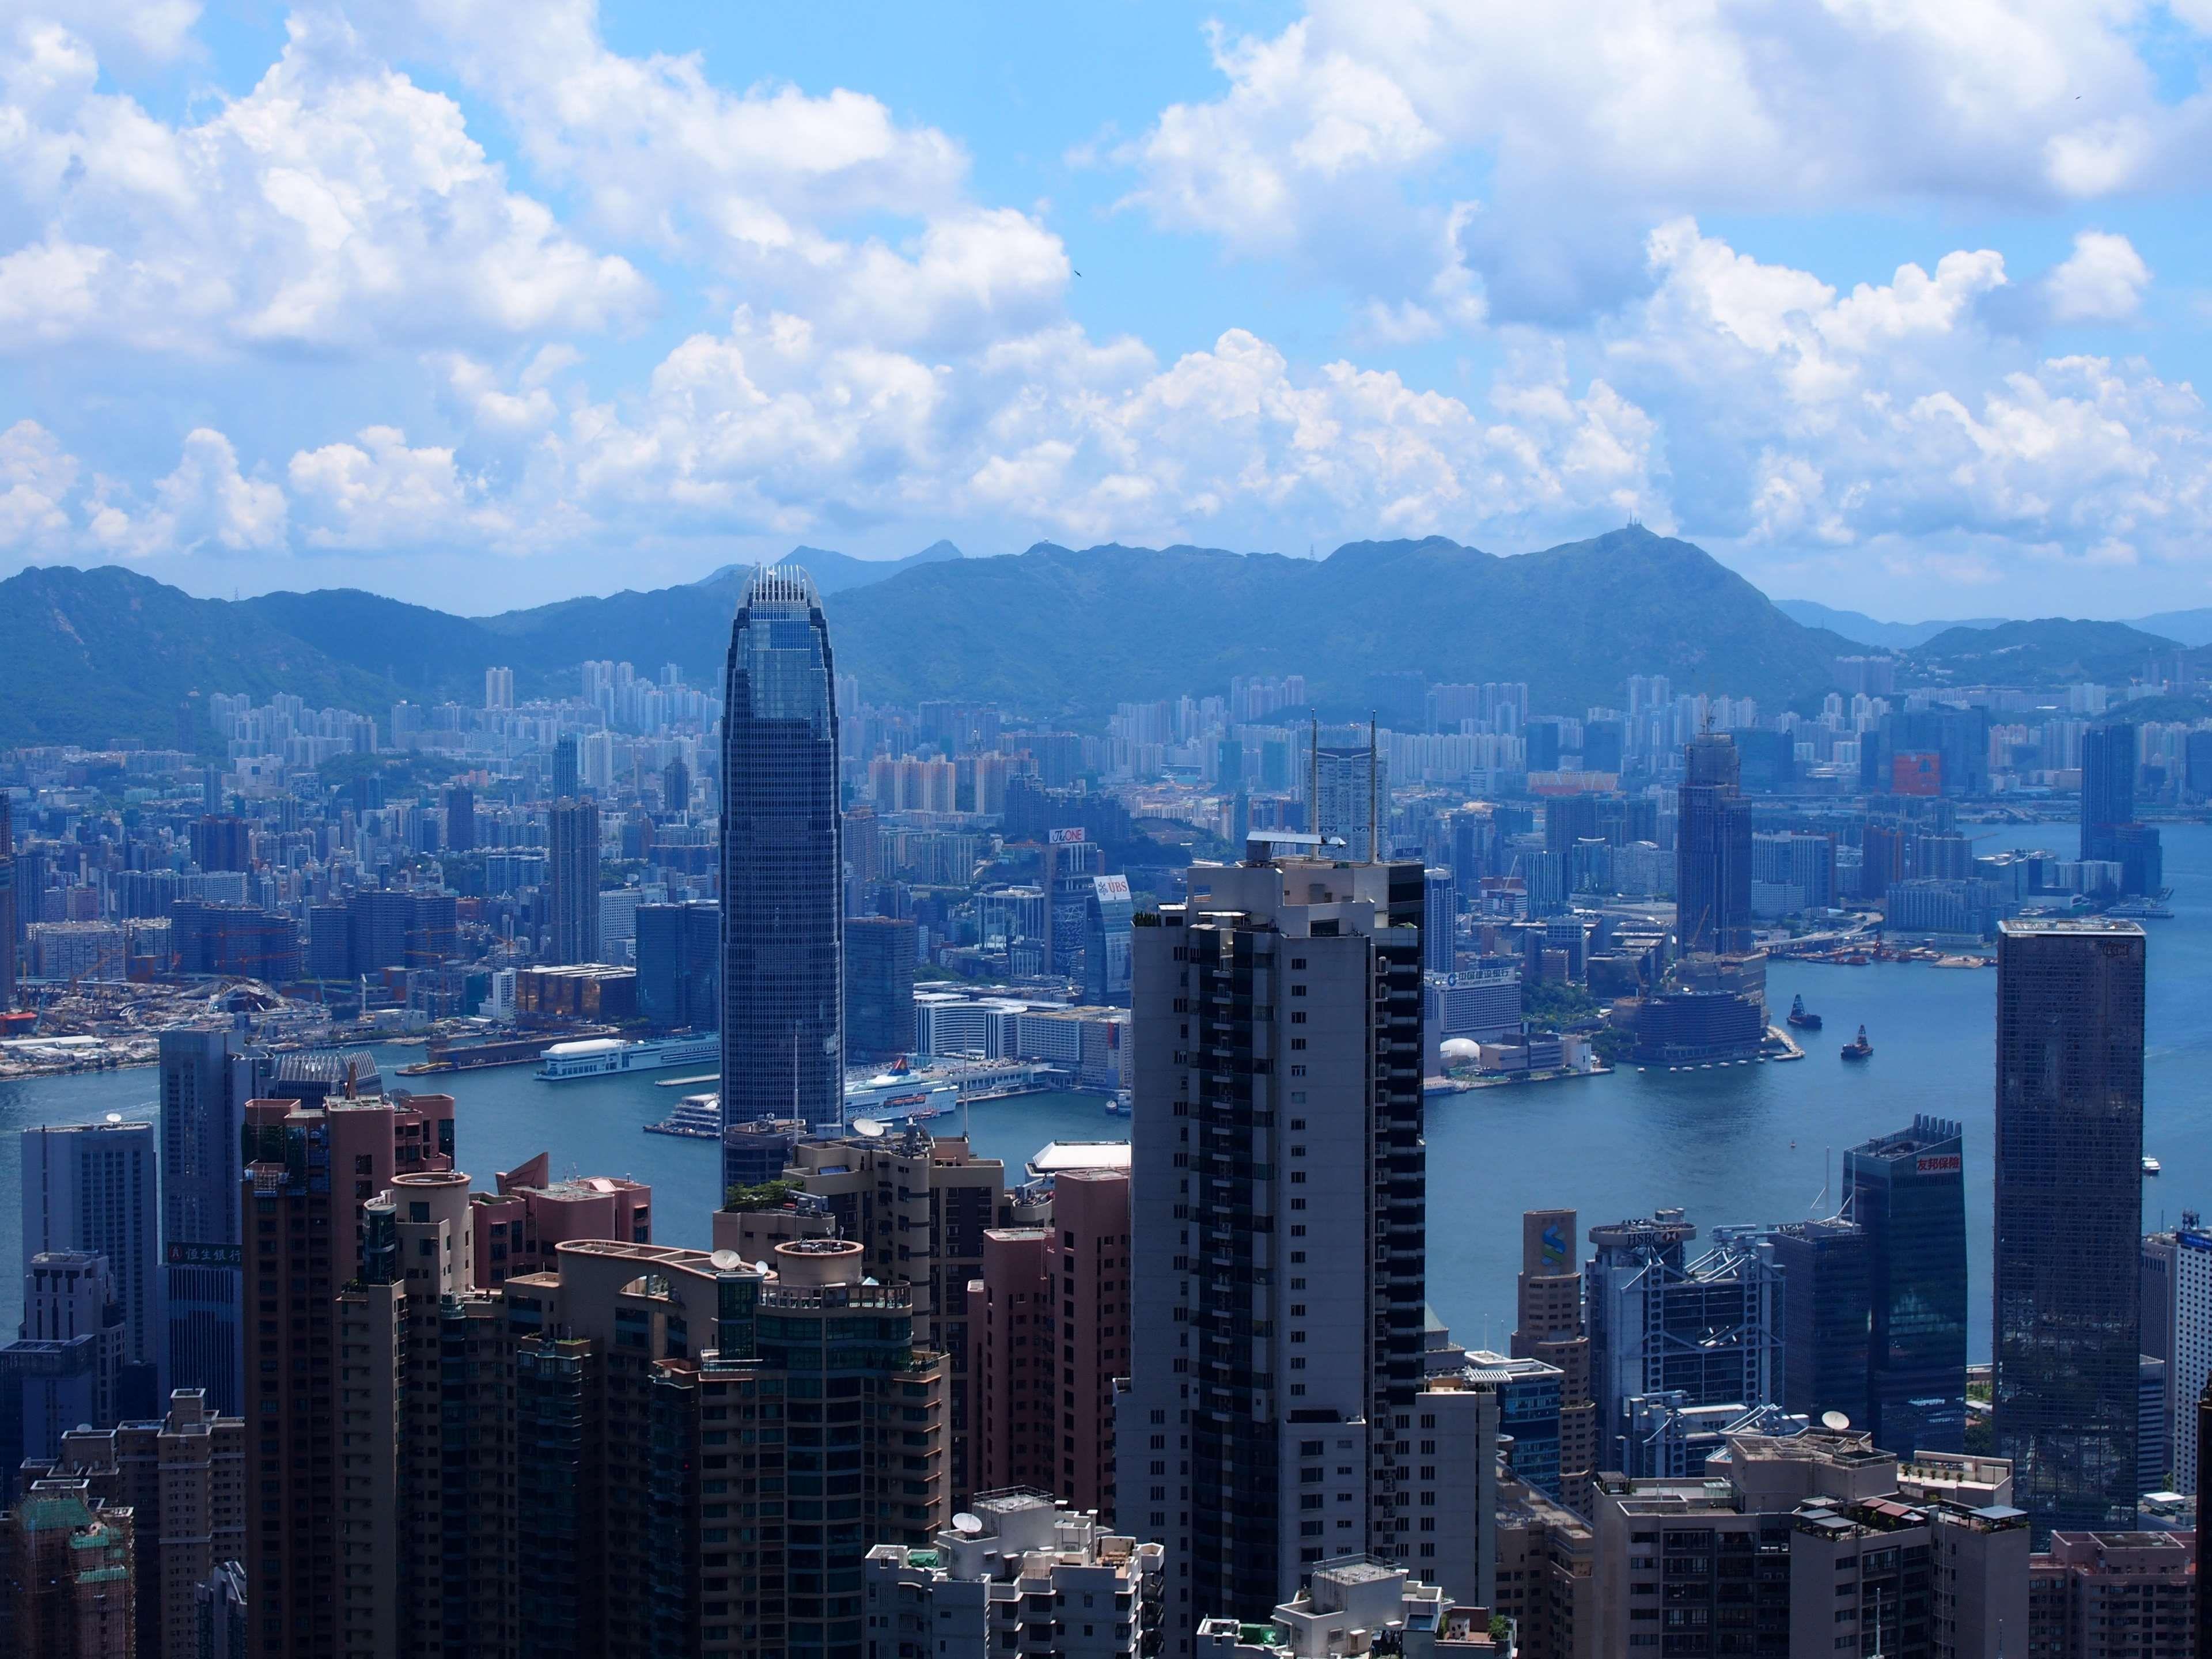 Blue Sky City Cityline Cityscape Cityscrapers Cityview Cloudy Sky Coast Mountains Hongkong Mountain Skyline Skyscraper Skys Skyline Cityscape City